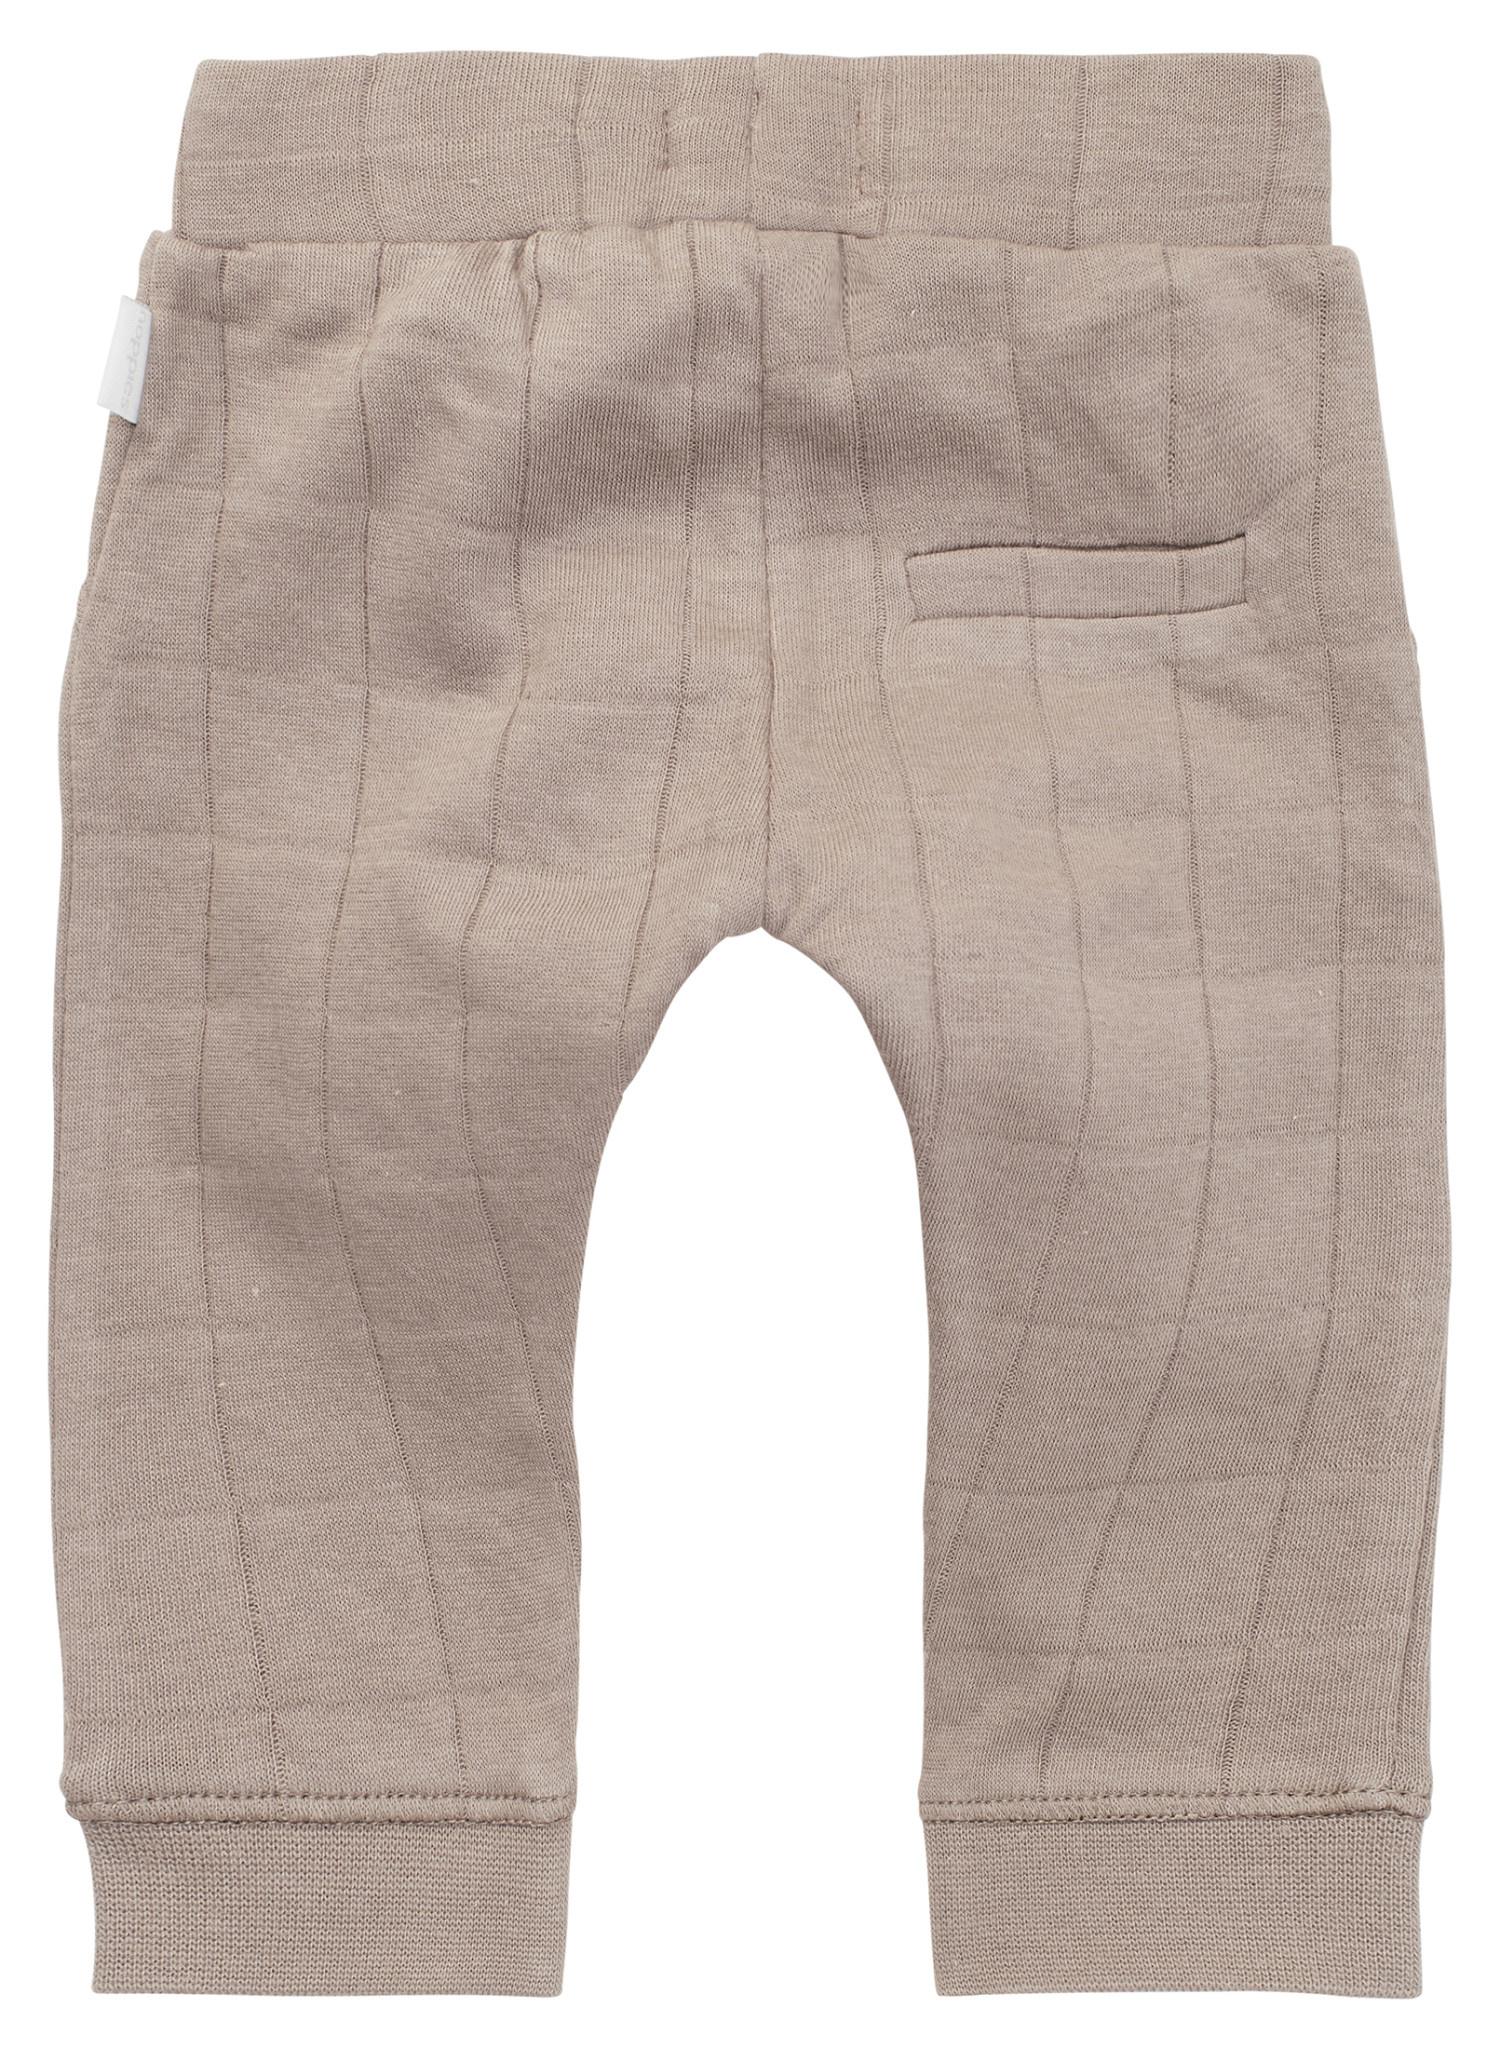 Rattvik Regular Fit Pants